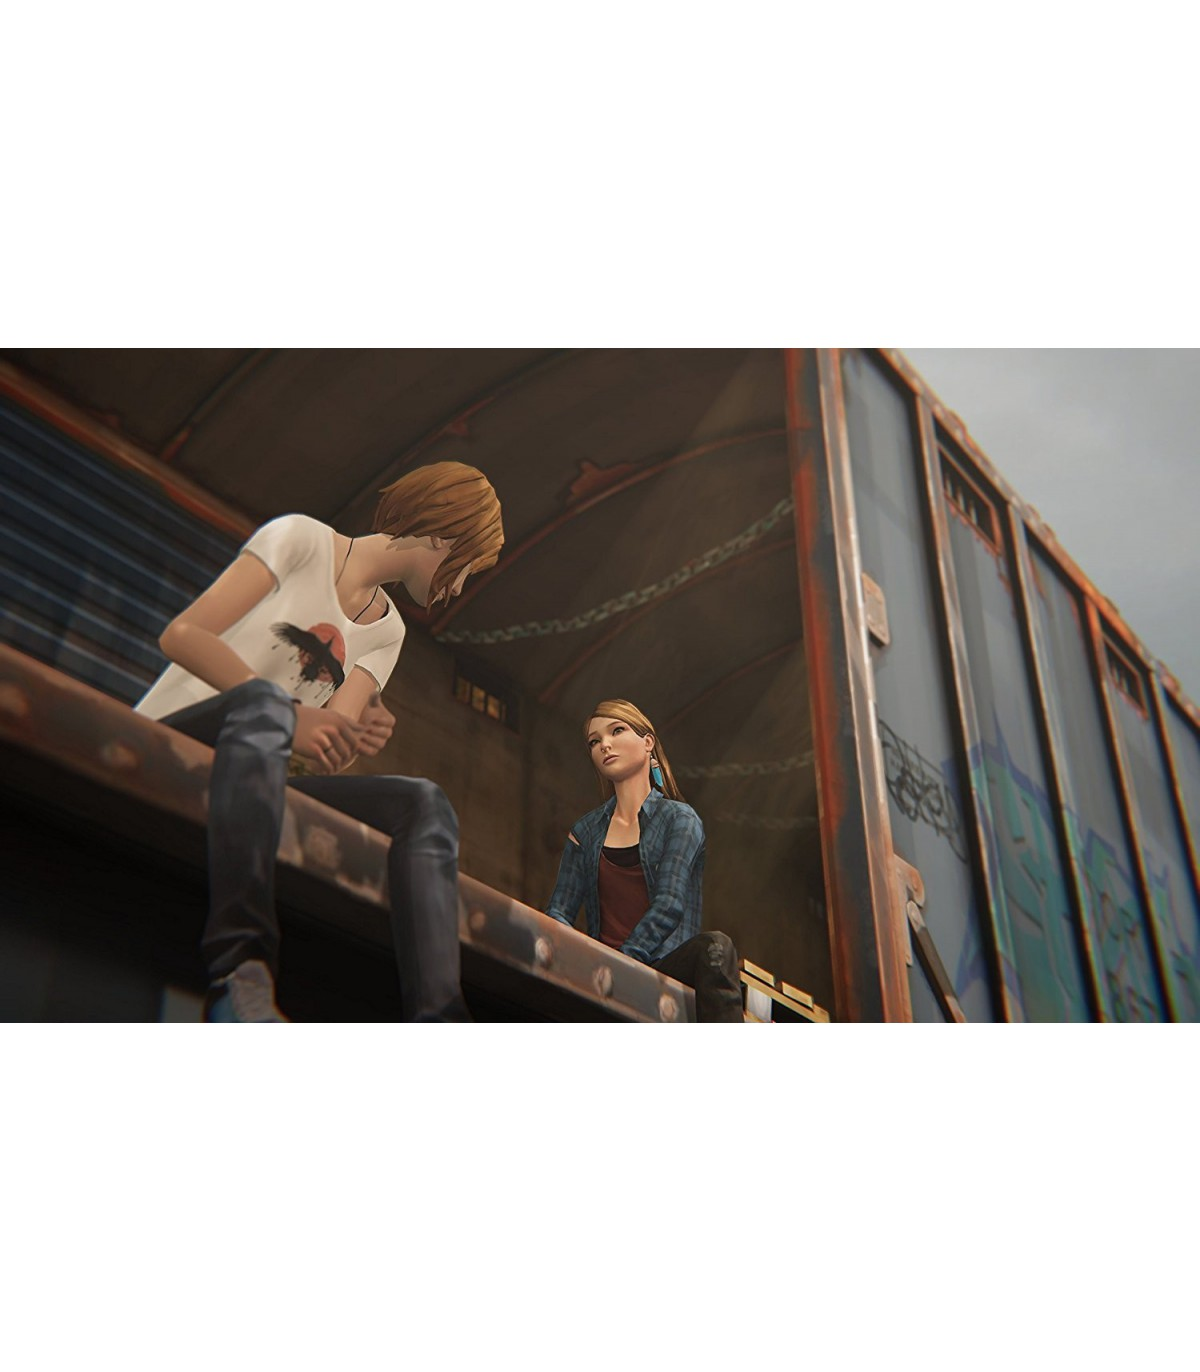 بازی Life is Strange: Before The Storm - ایکس باکس وان